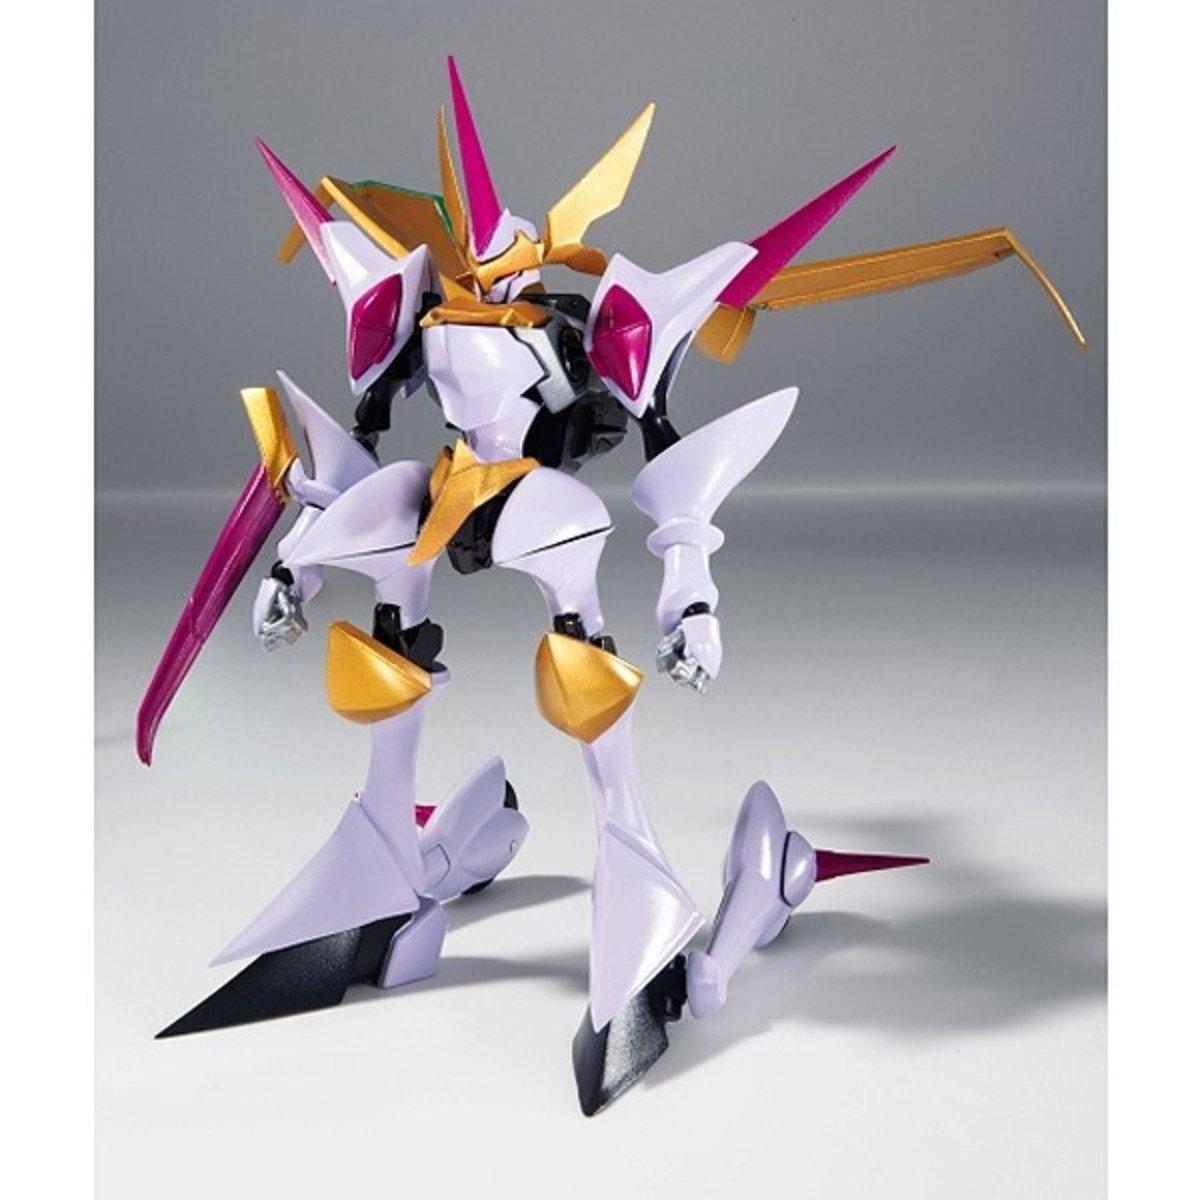 Robot 魂  Code Geass 叛逆的魯魯修 -  帕西瓦爾  (魂商店限定)